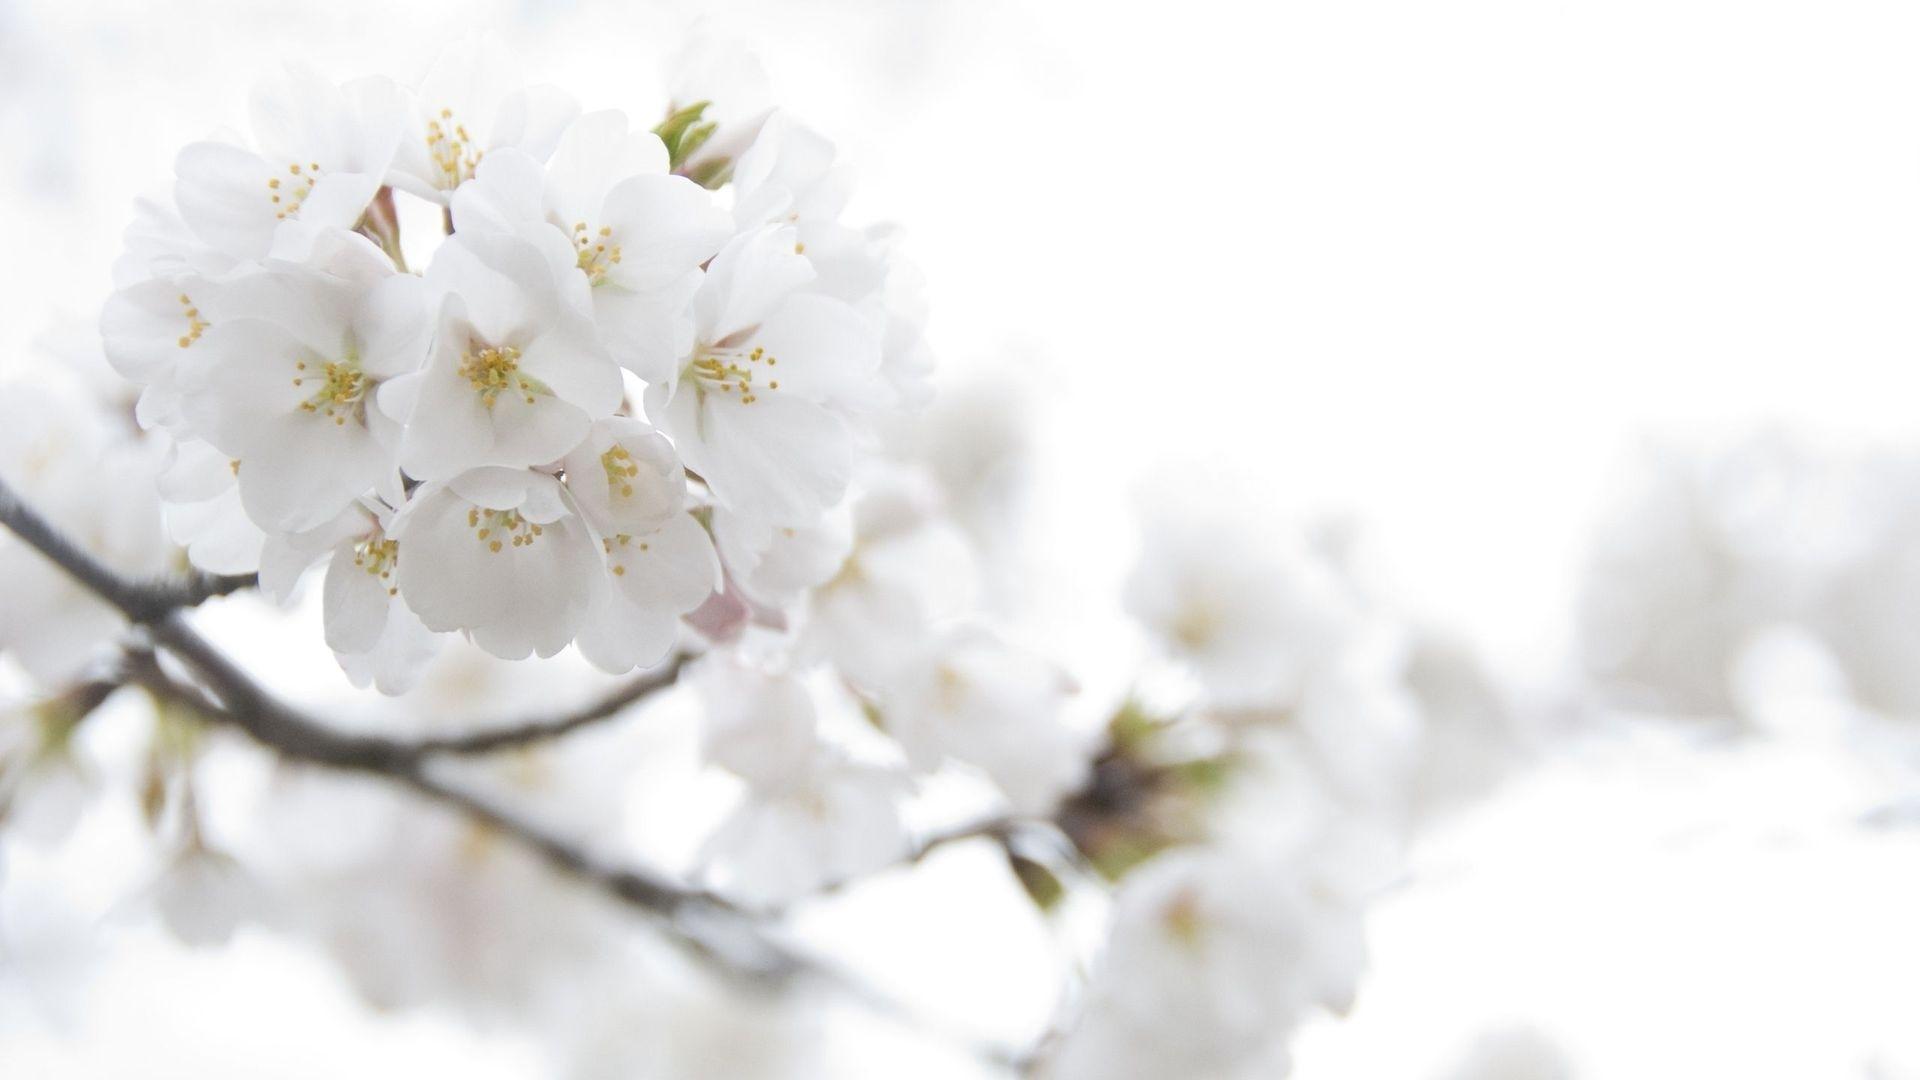 white floral wallpaper 46 background - hdflowerwallpaper